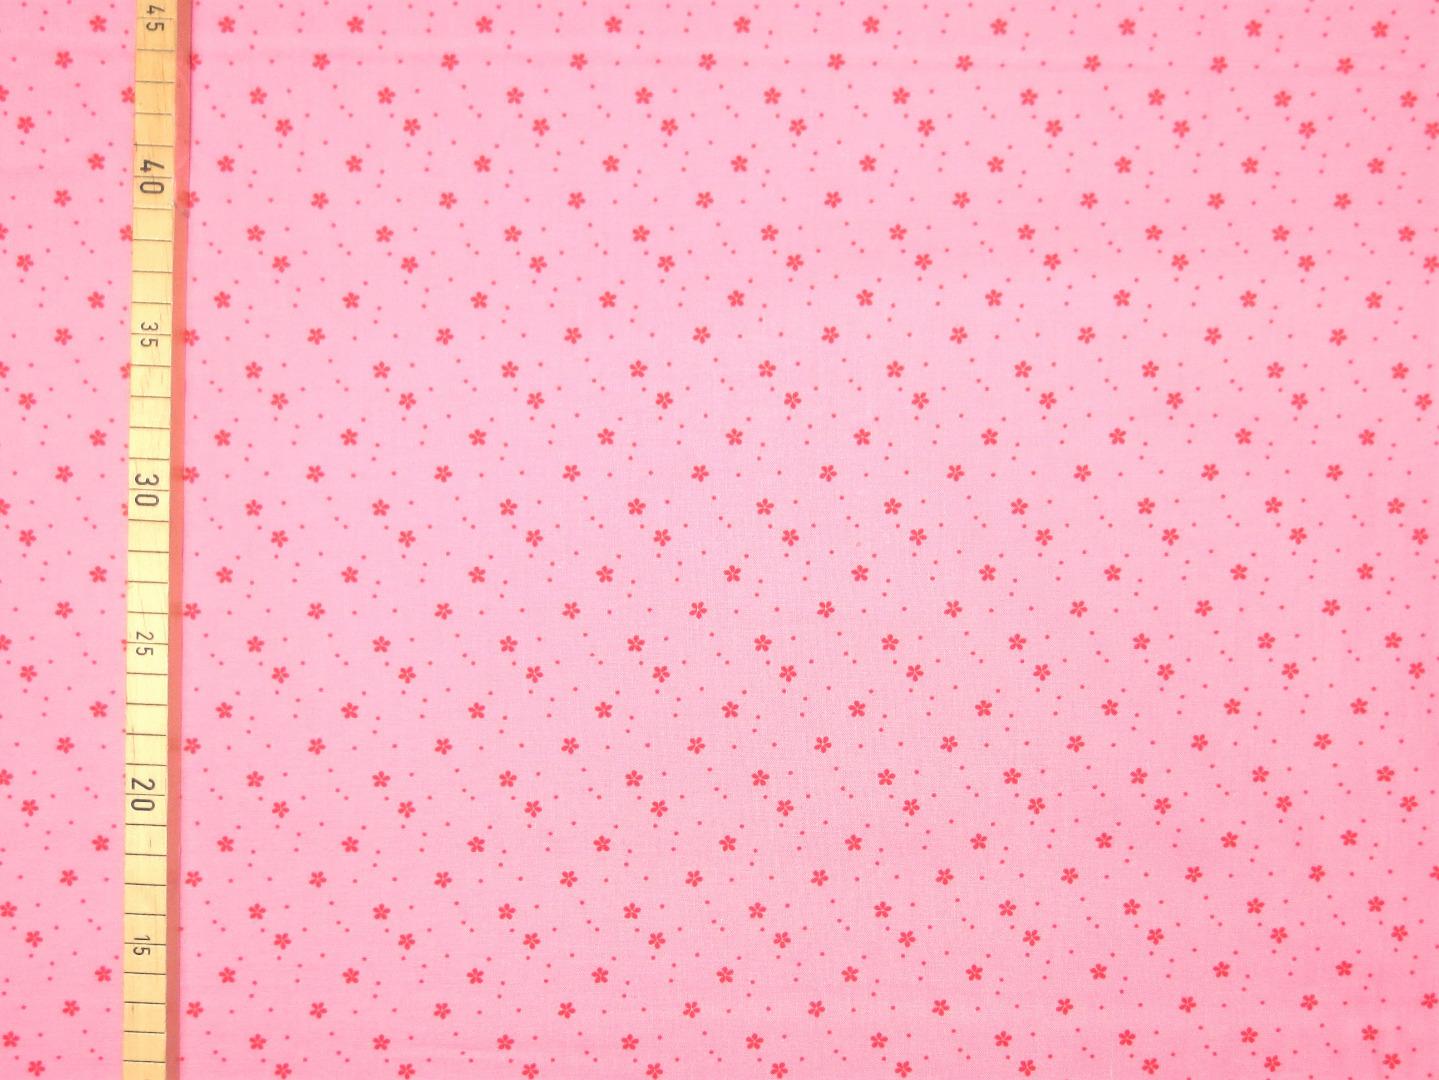 Baumwollstoff Blümchen rosa-rot Westfalenstoffe 100 Baumwolle